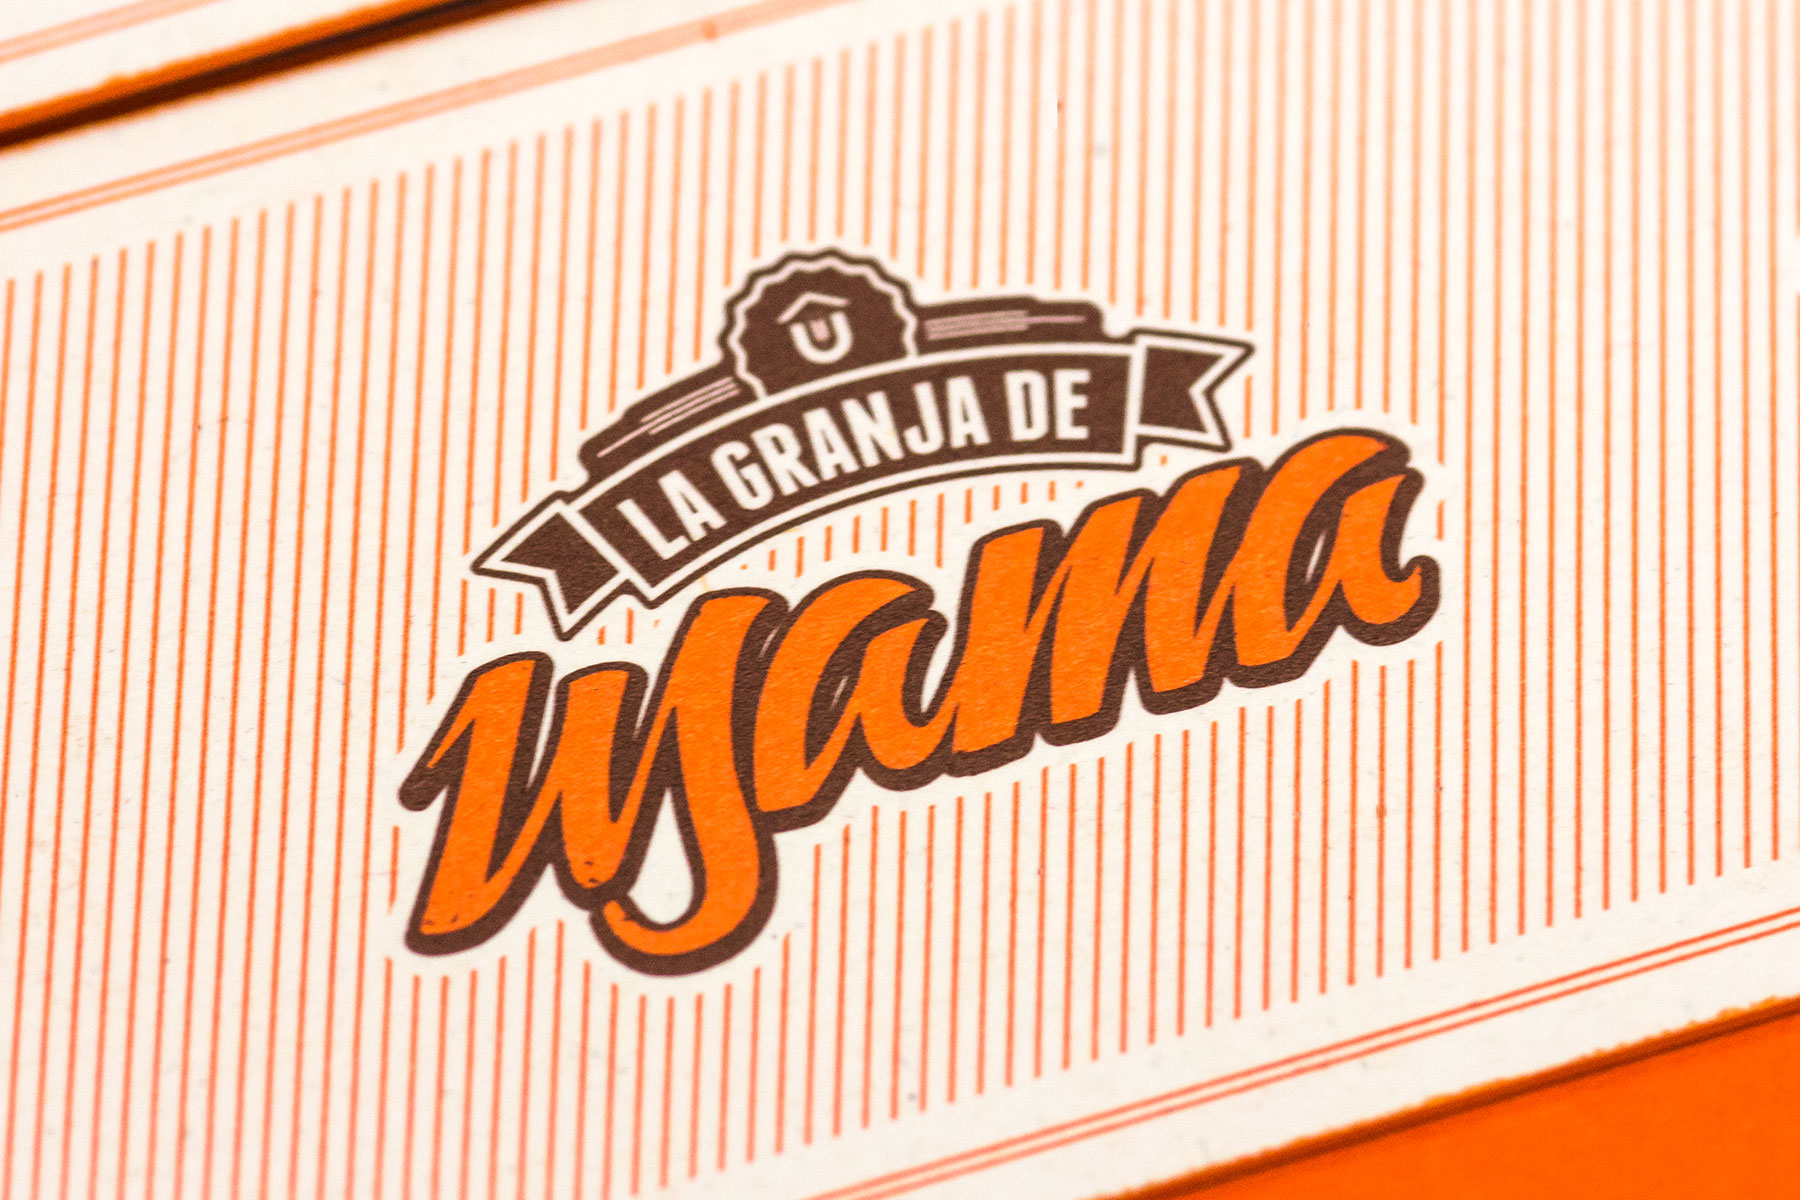 LA GRANJA DE USAMA